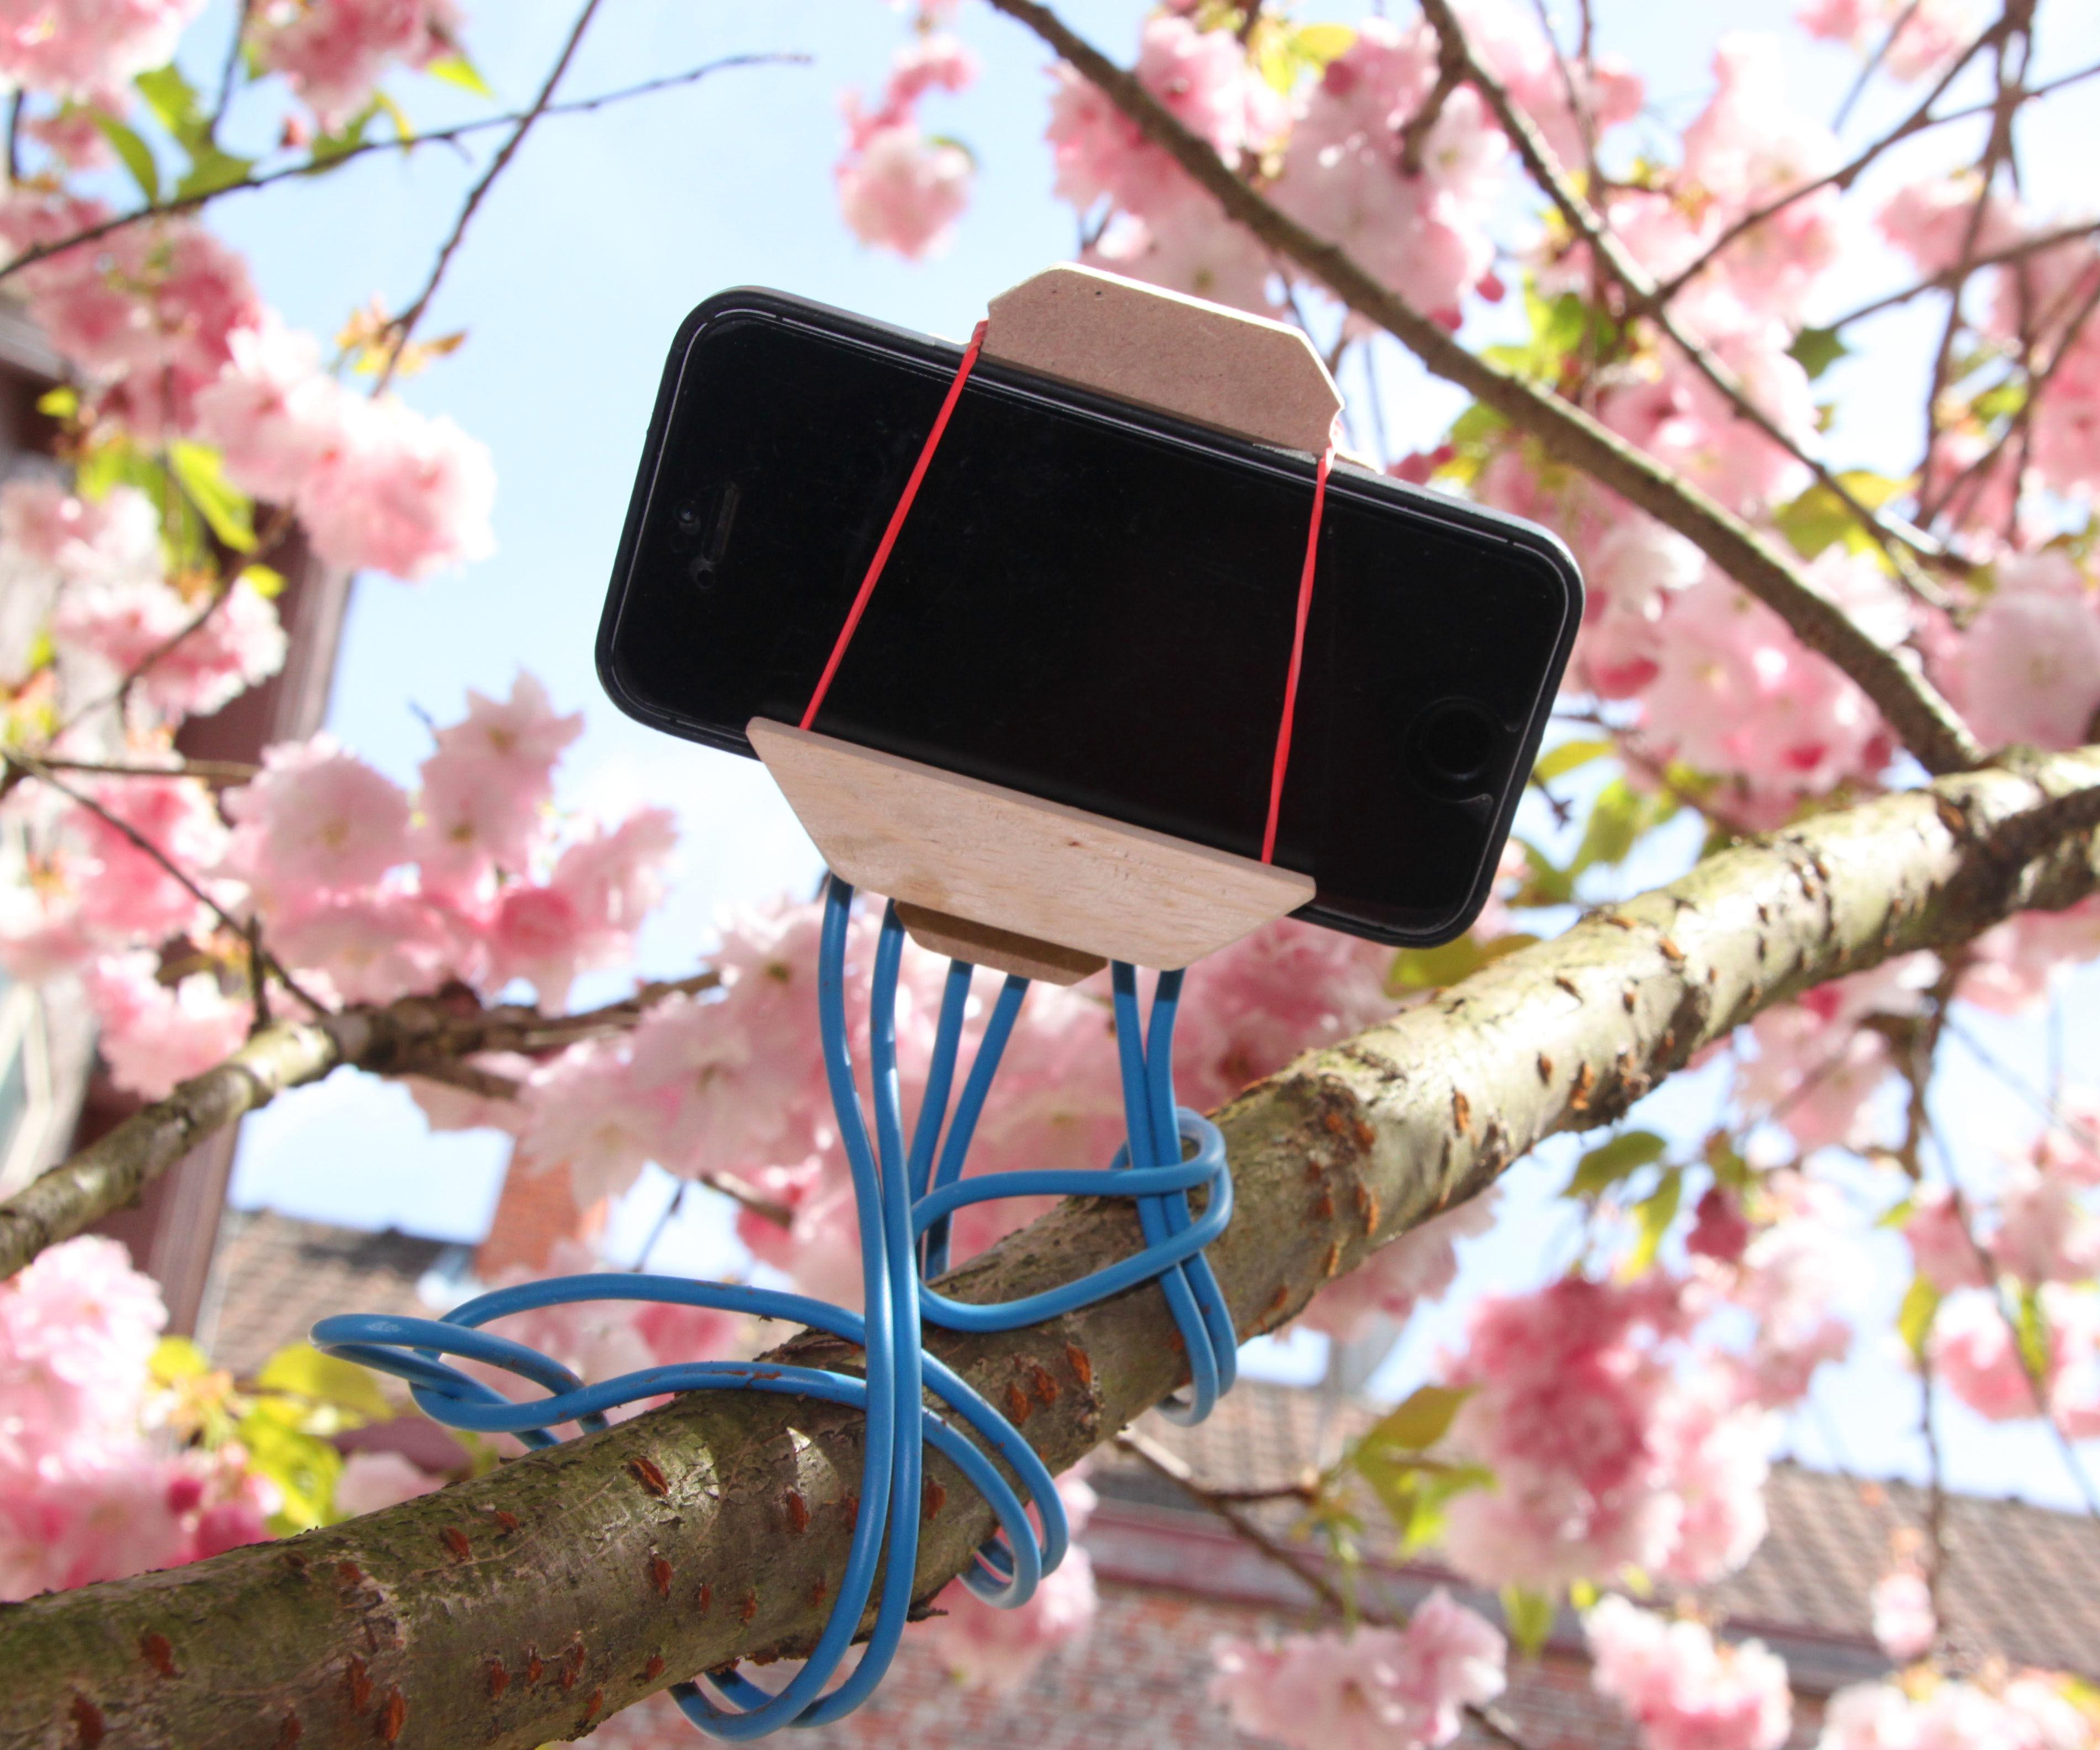 Flexible Smartphone Tripod